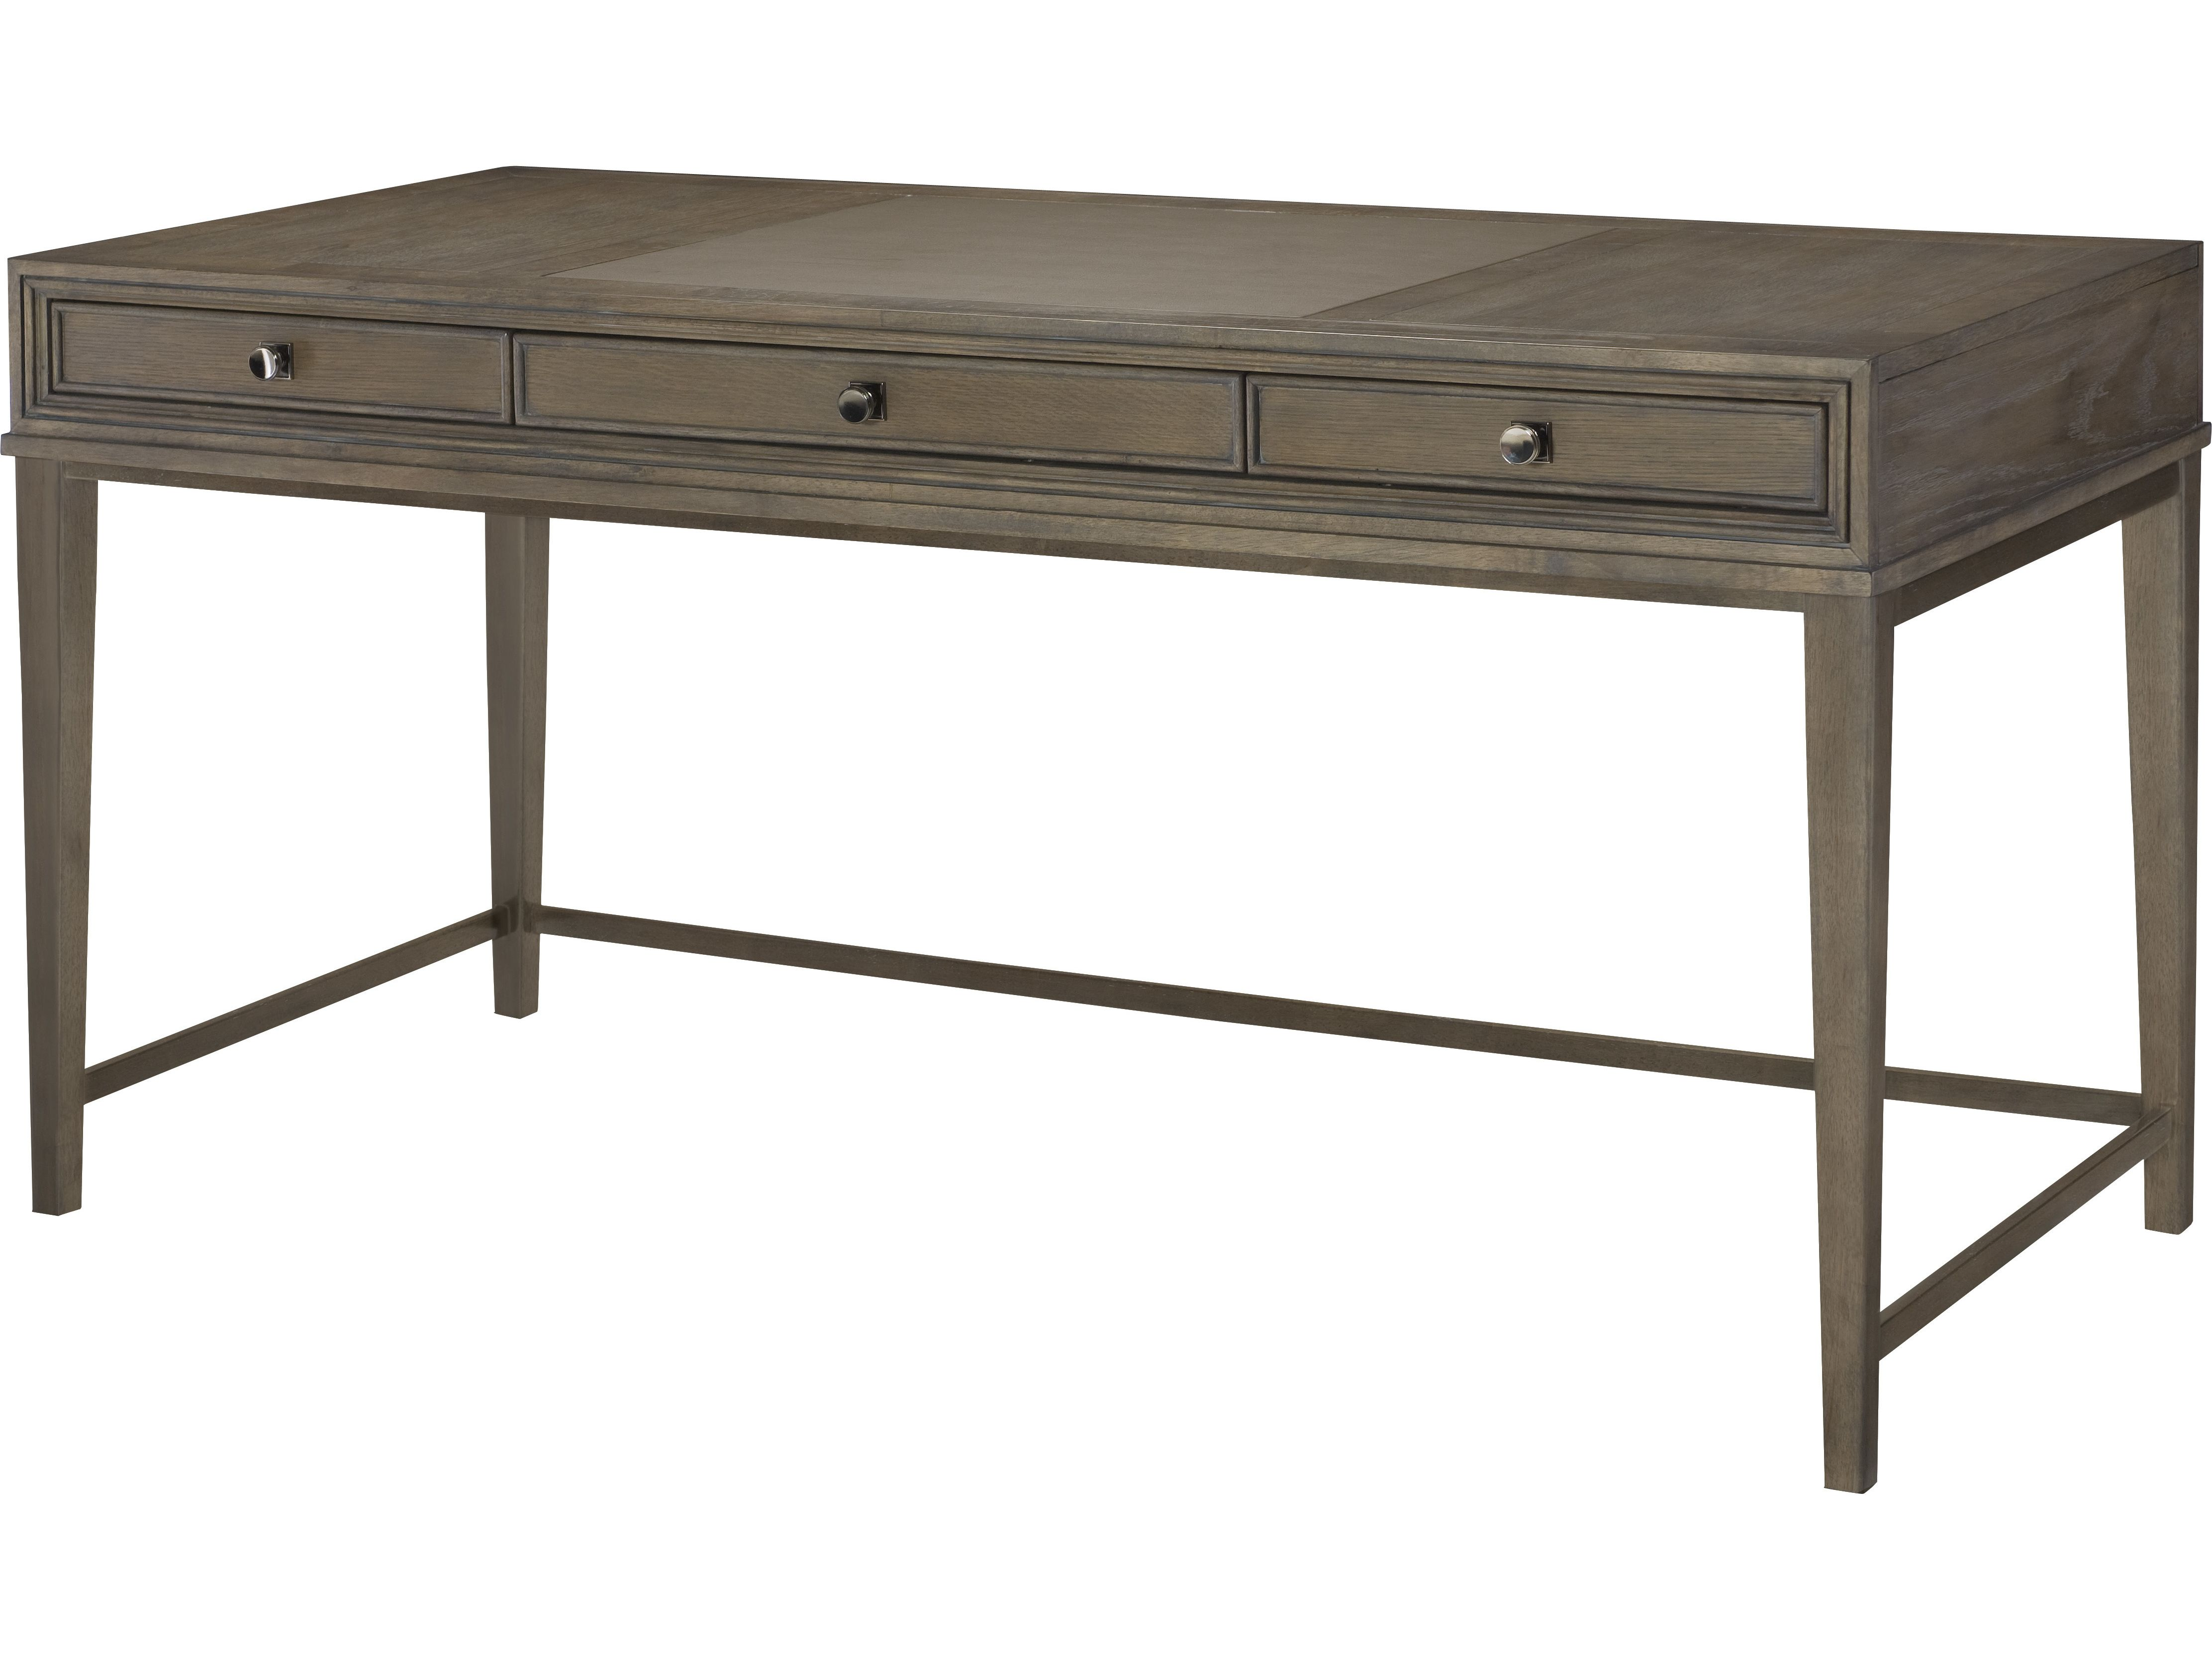 kitchen dining desk homes grey safavieh amazon collection com wyatt american writing gray dp